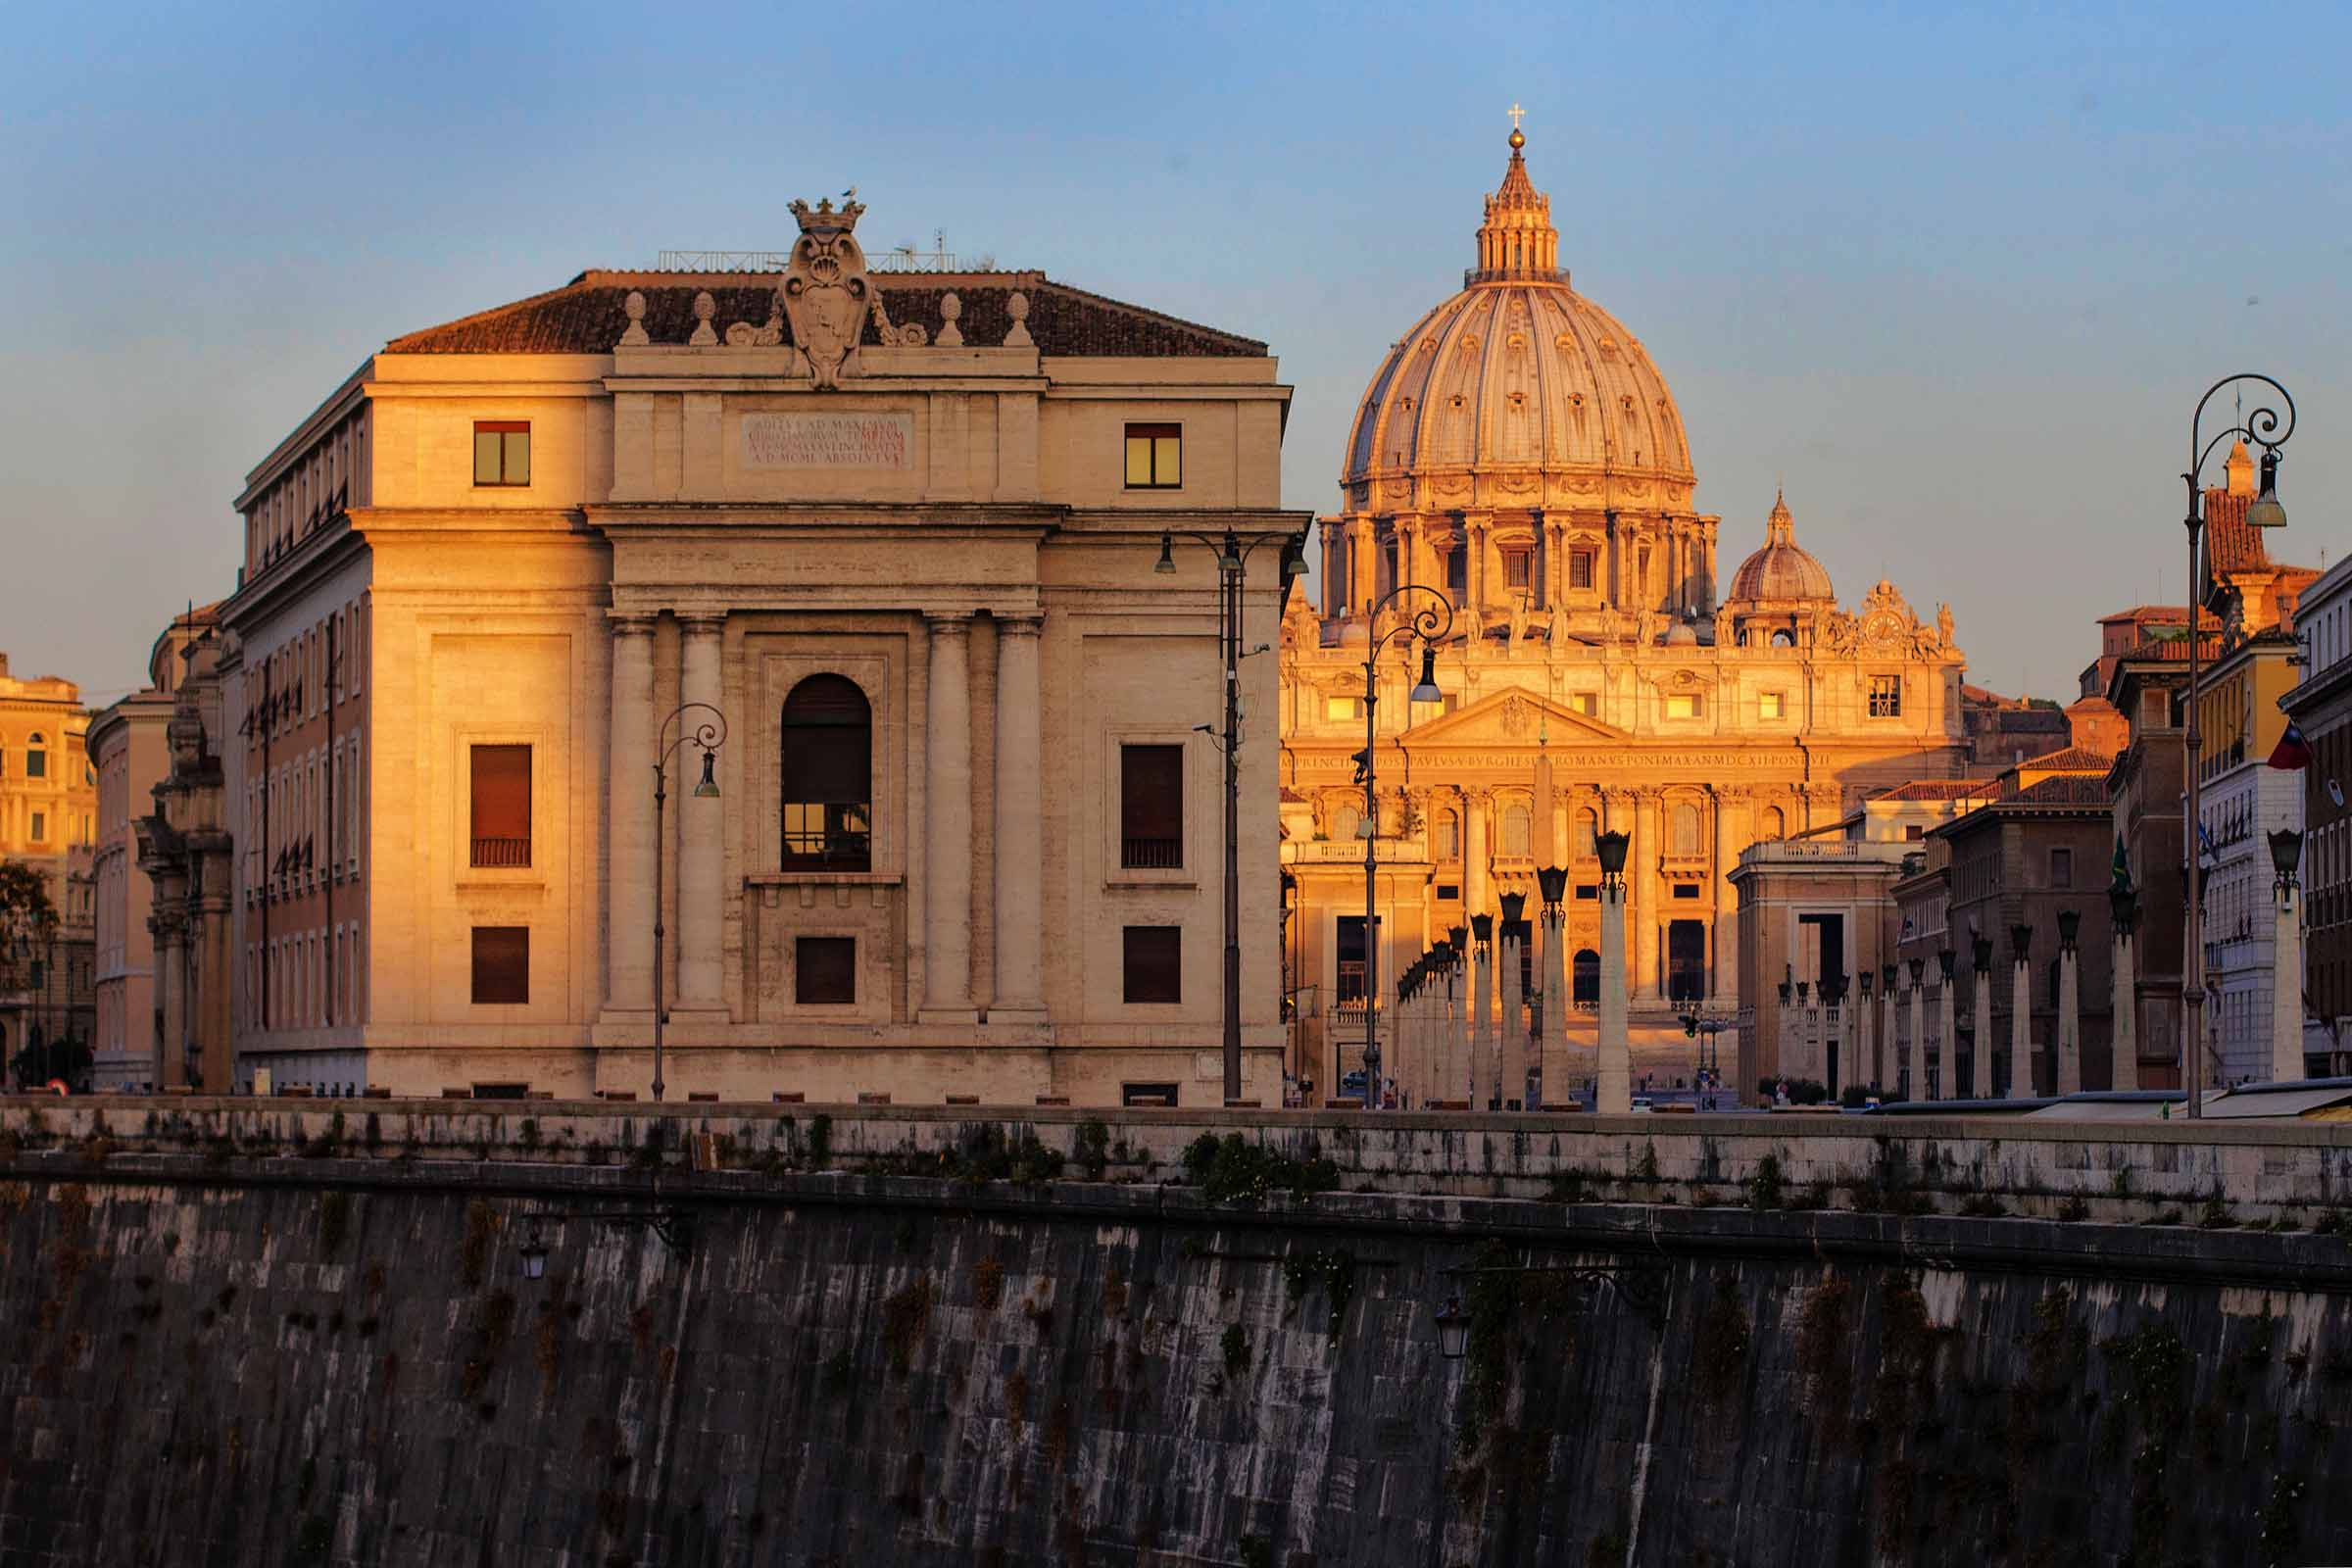 San Pietro all'alba